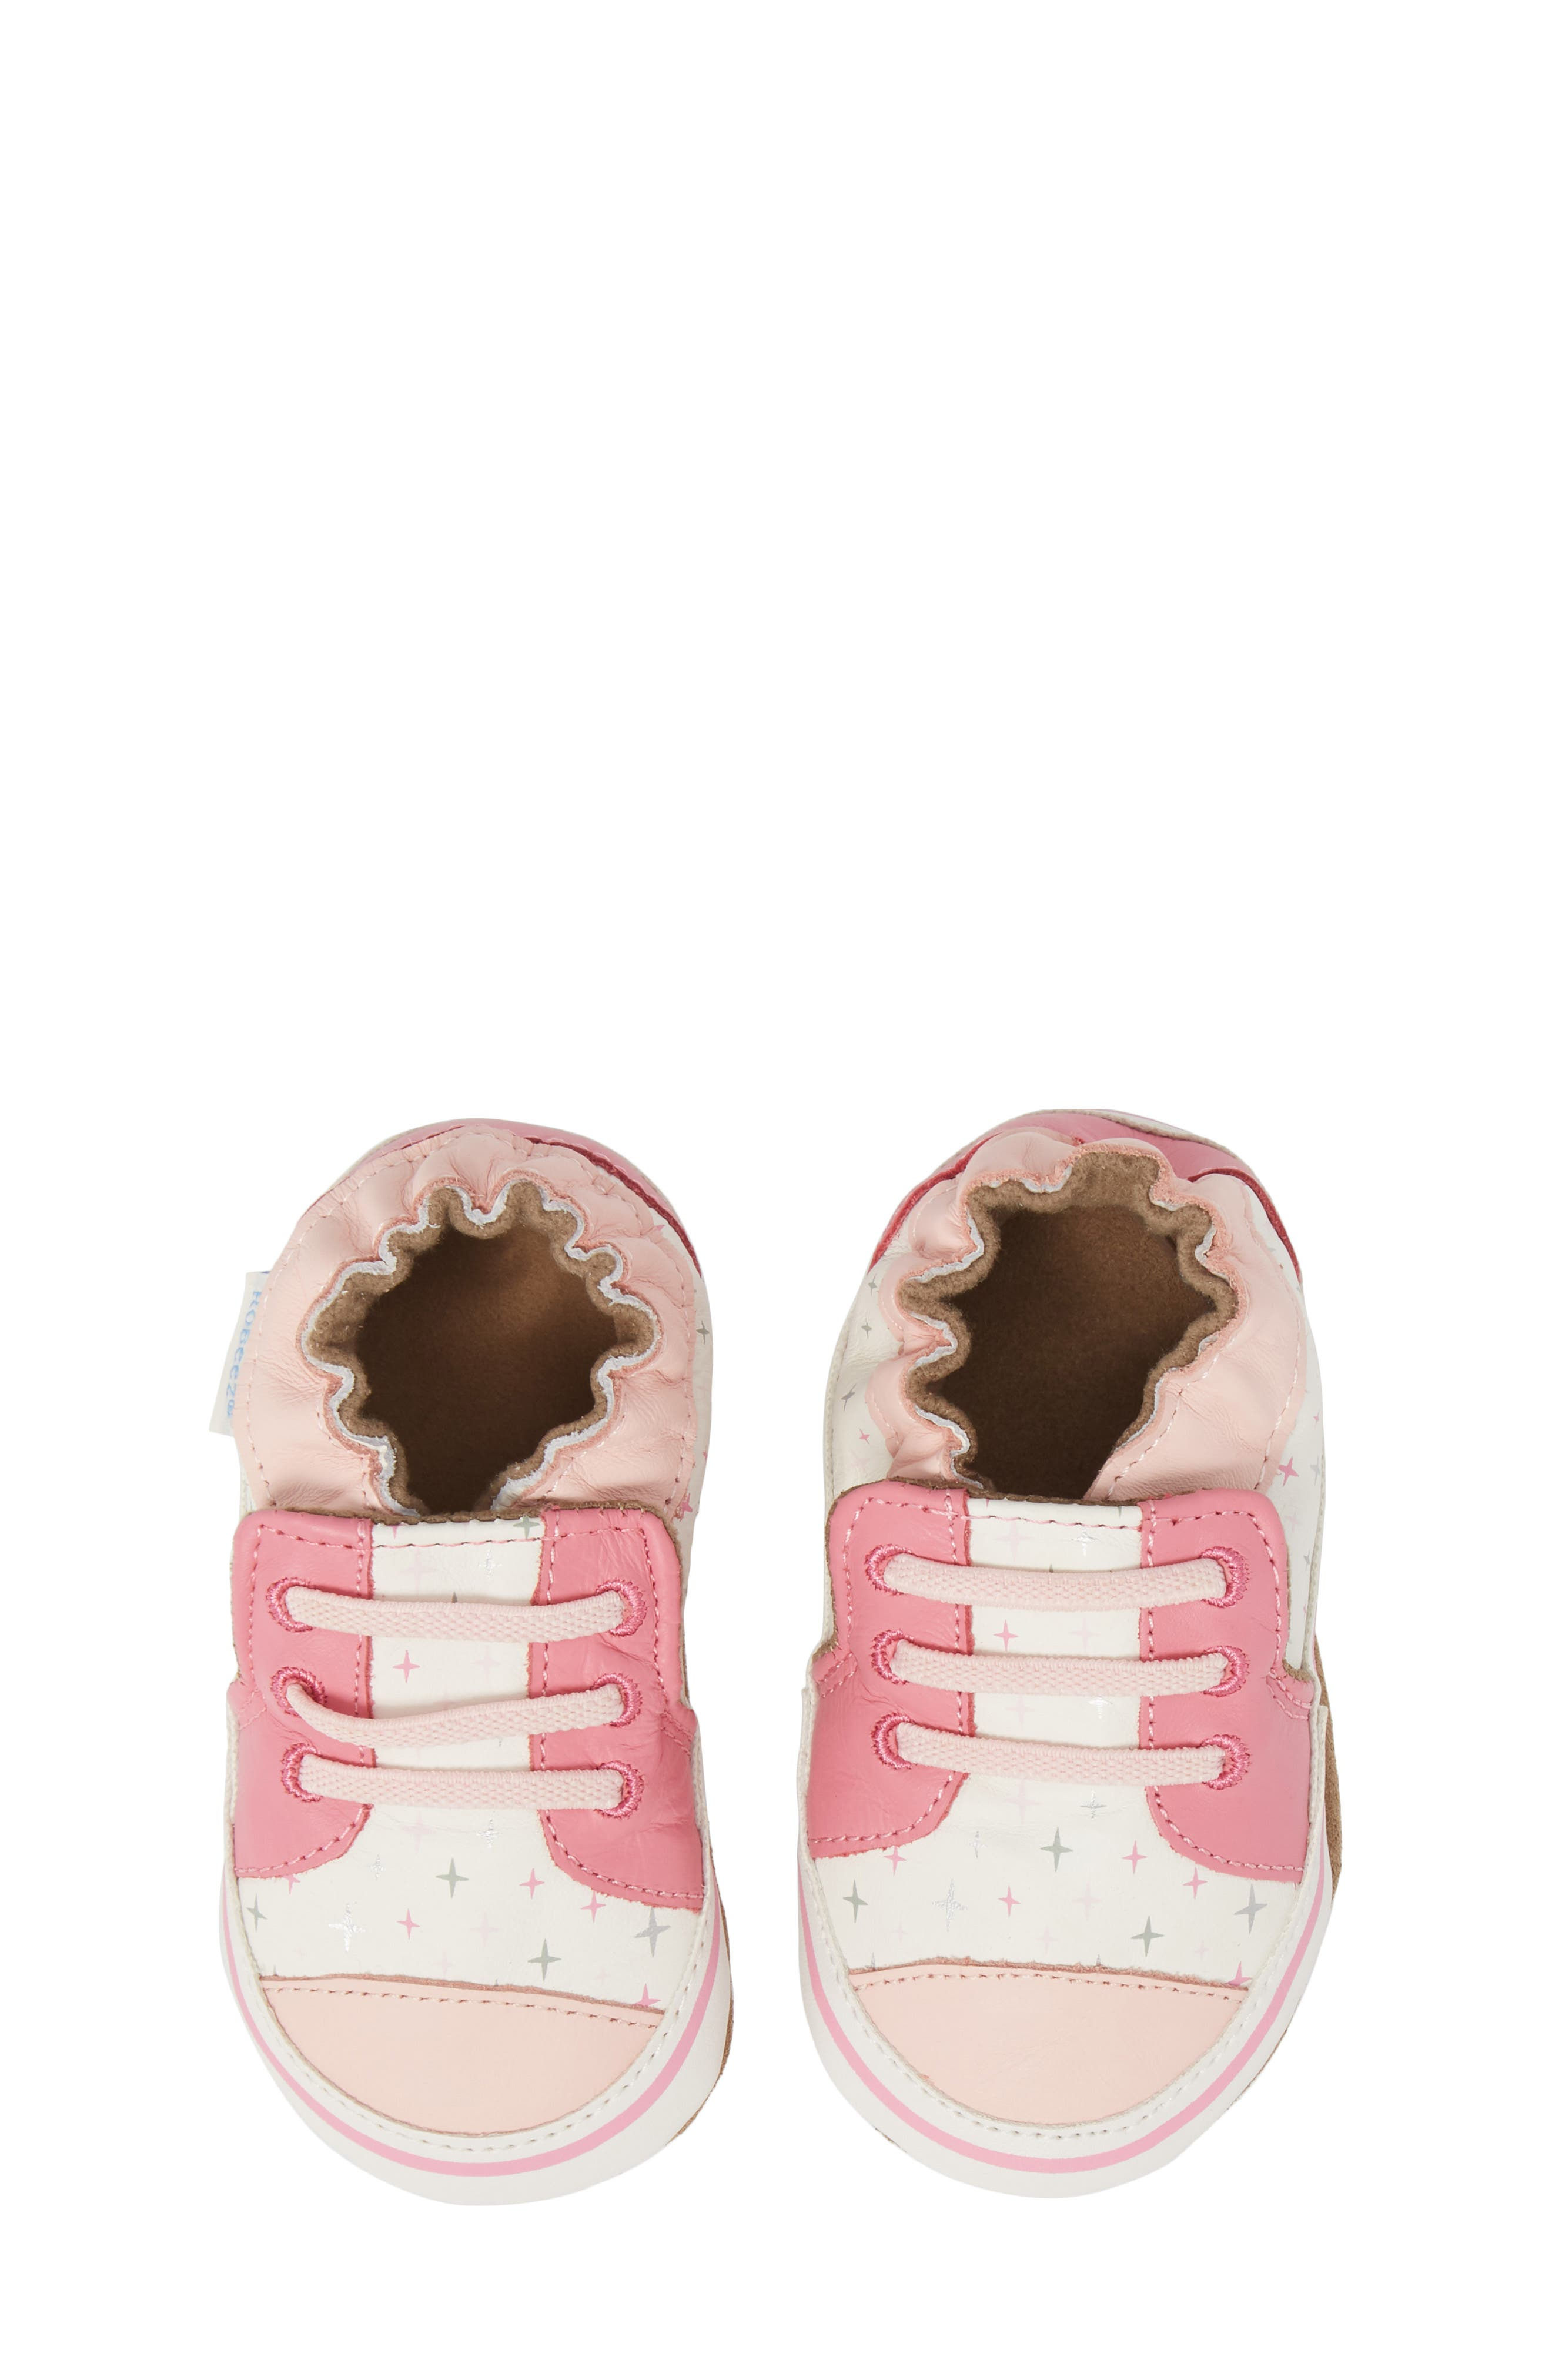 Alternate Image 1 Selected - Robeez® Trendy Trainer Sneaker Crib Shoe (Baby)